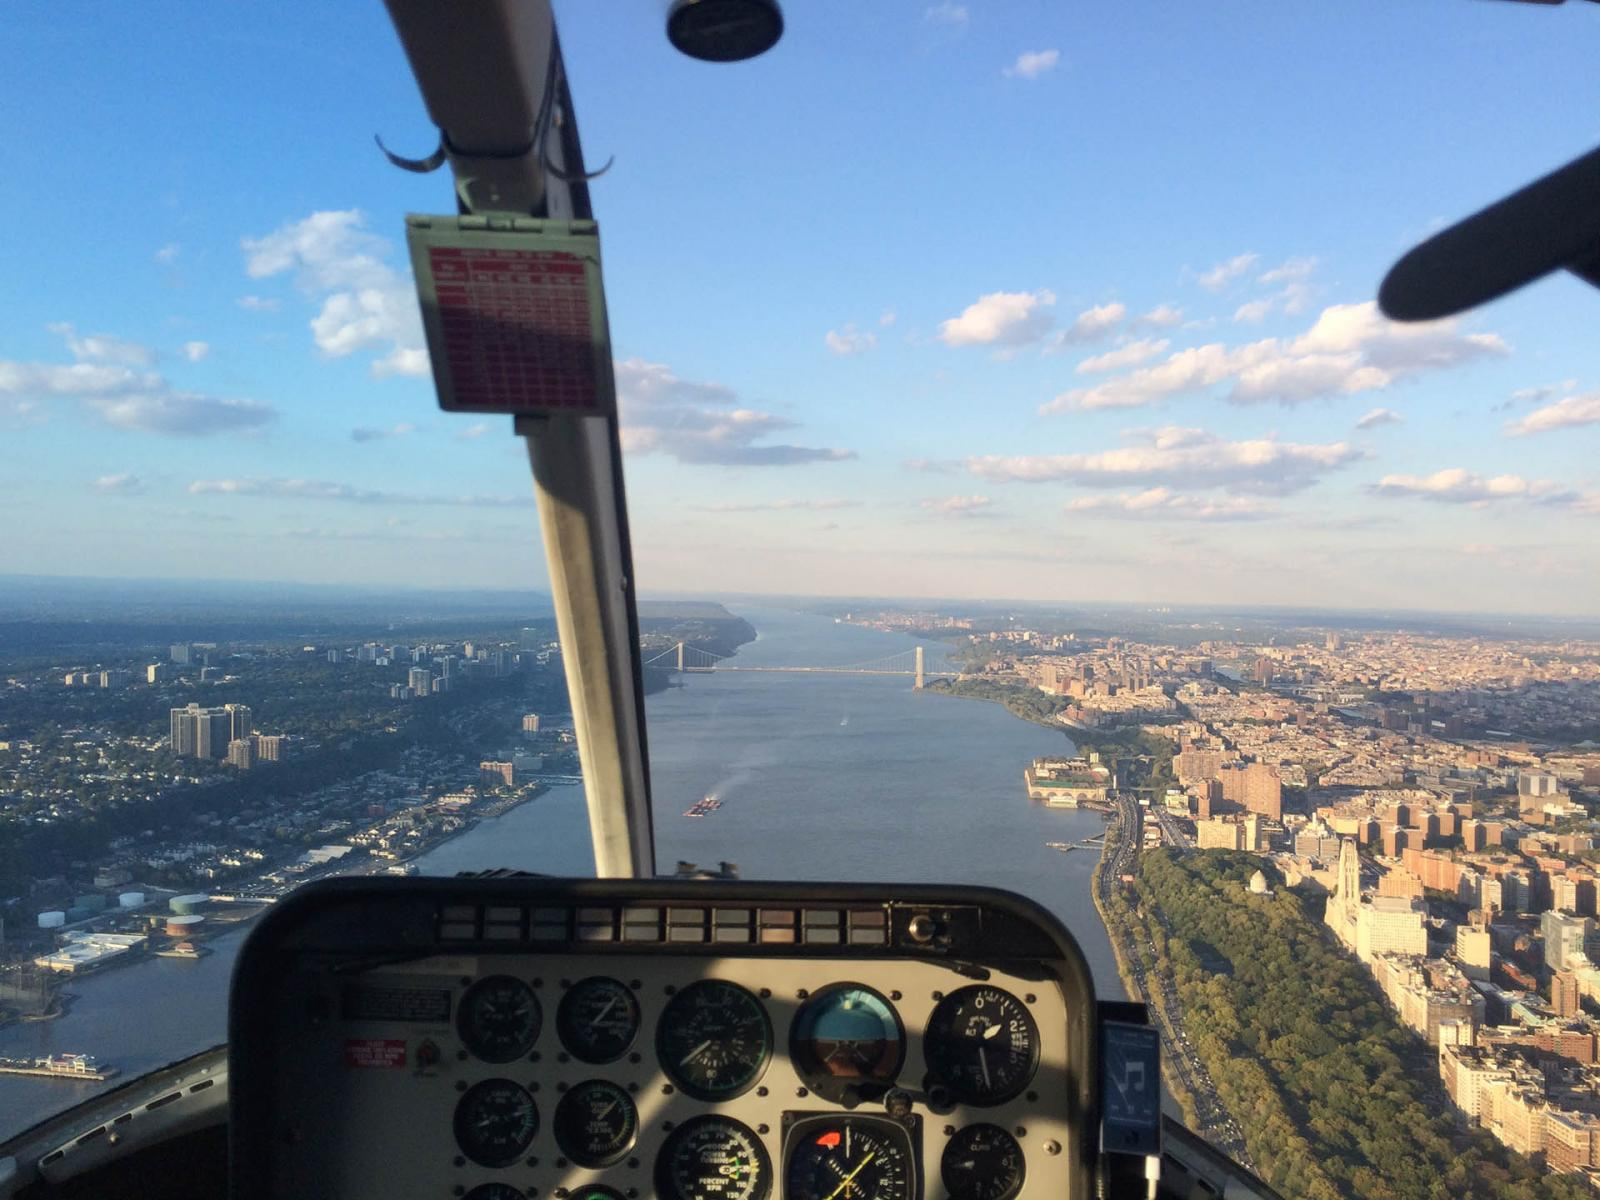 Helikopterflug New York 05